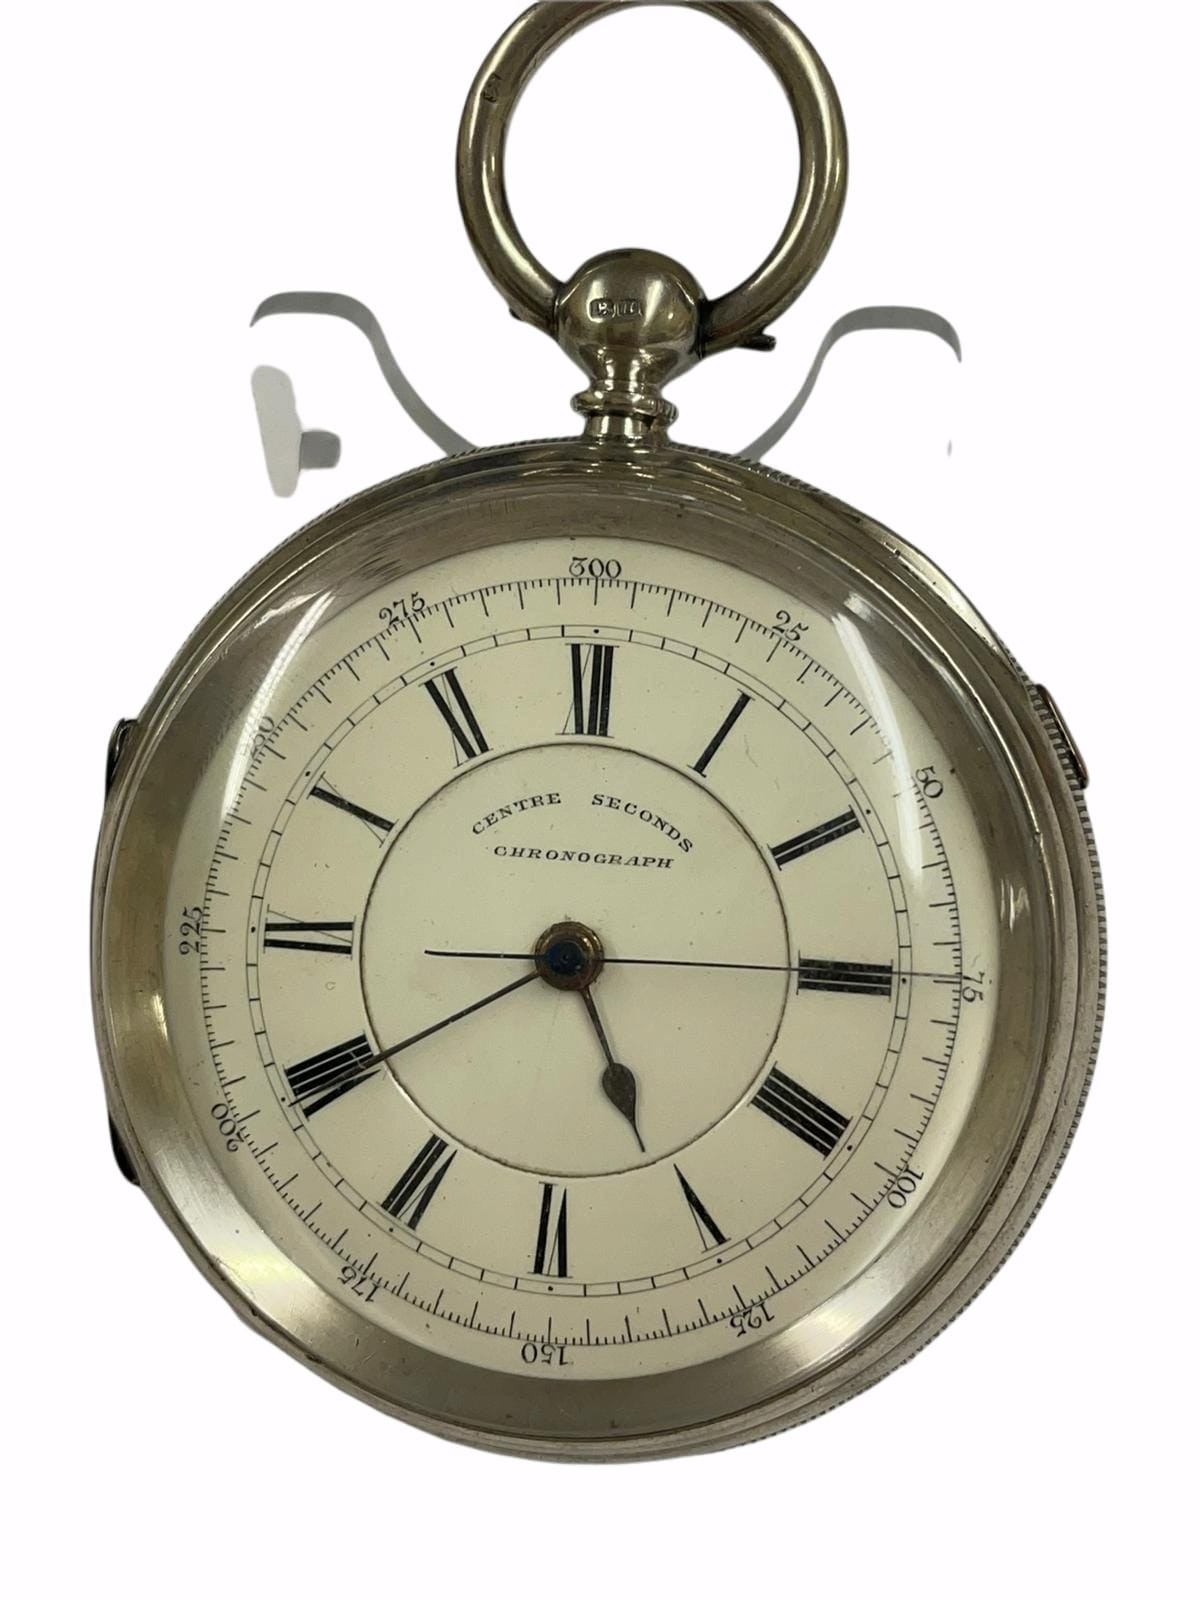 Antique Large silver stop seconds chronograph pocket watch J Harris & sons London & Manchester ,